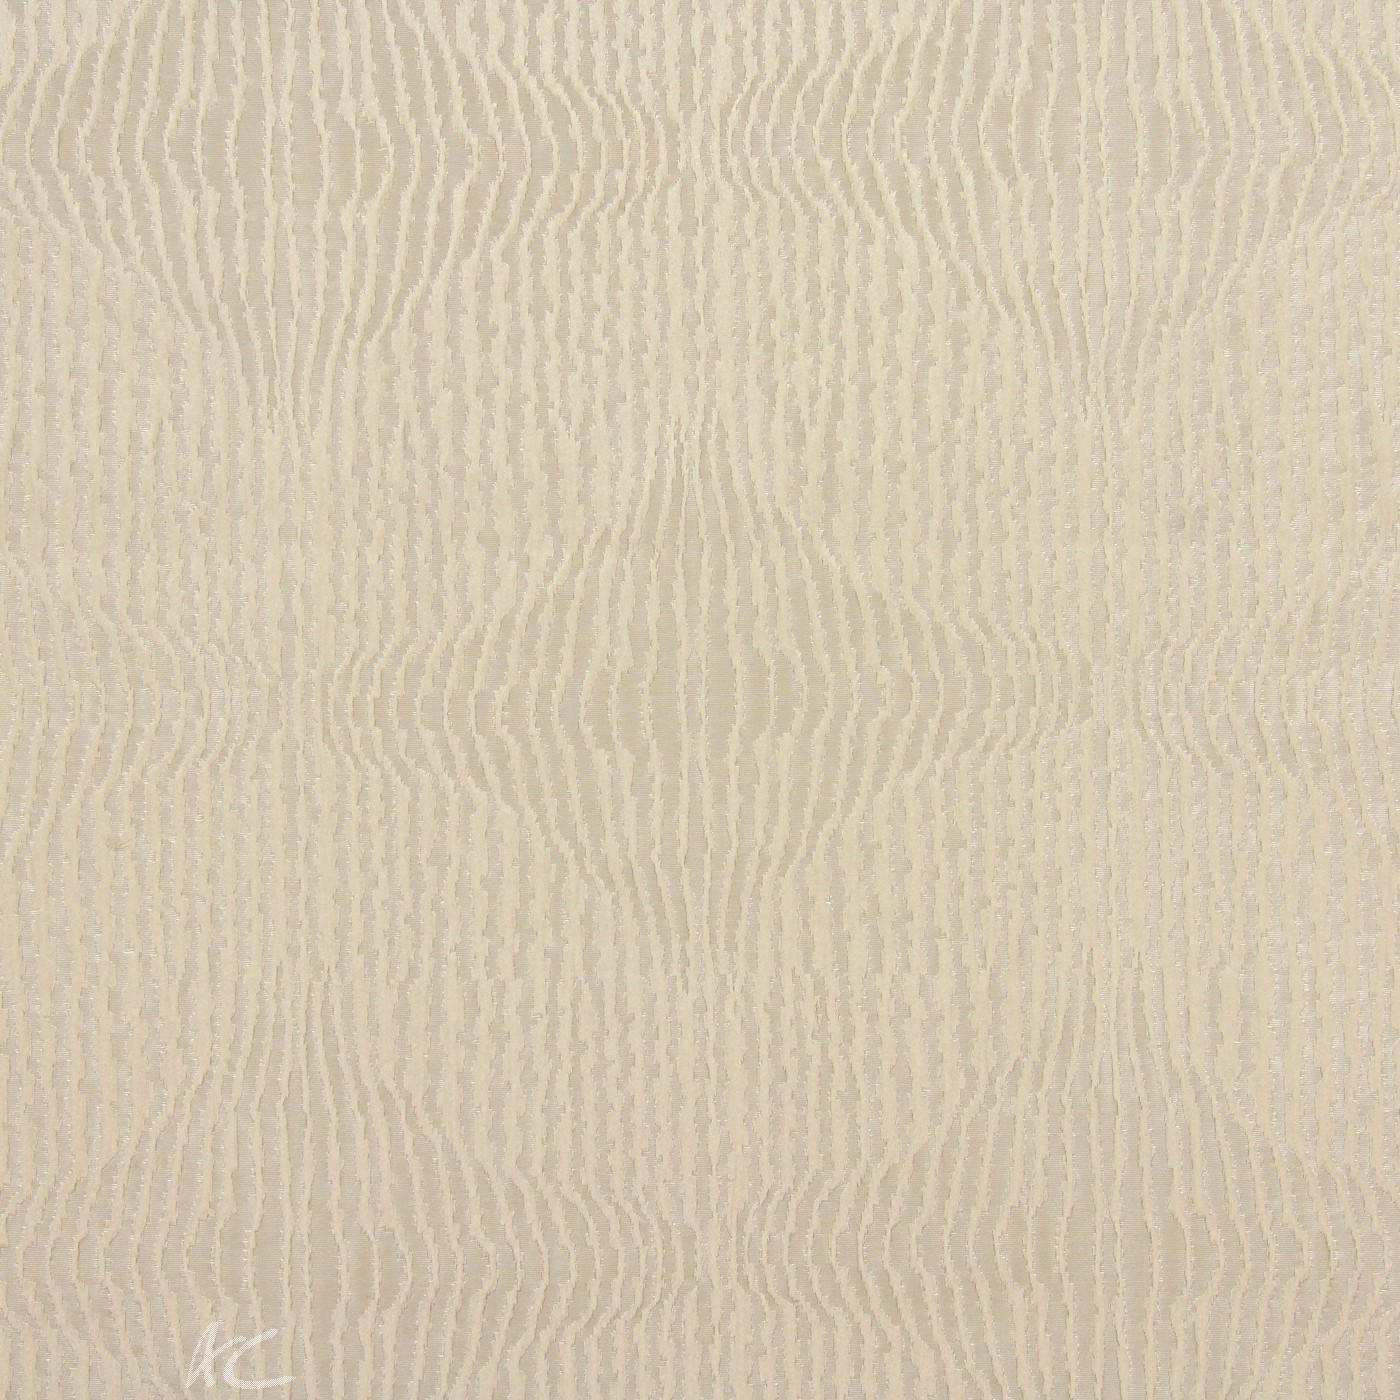 Prestigious Textiles Baroque Jessamine Burnished Cushion Covers